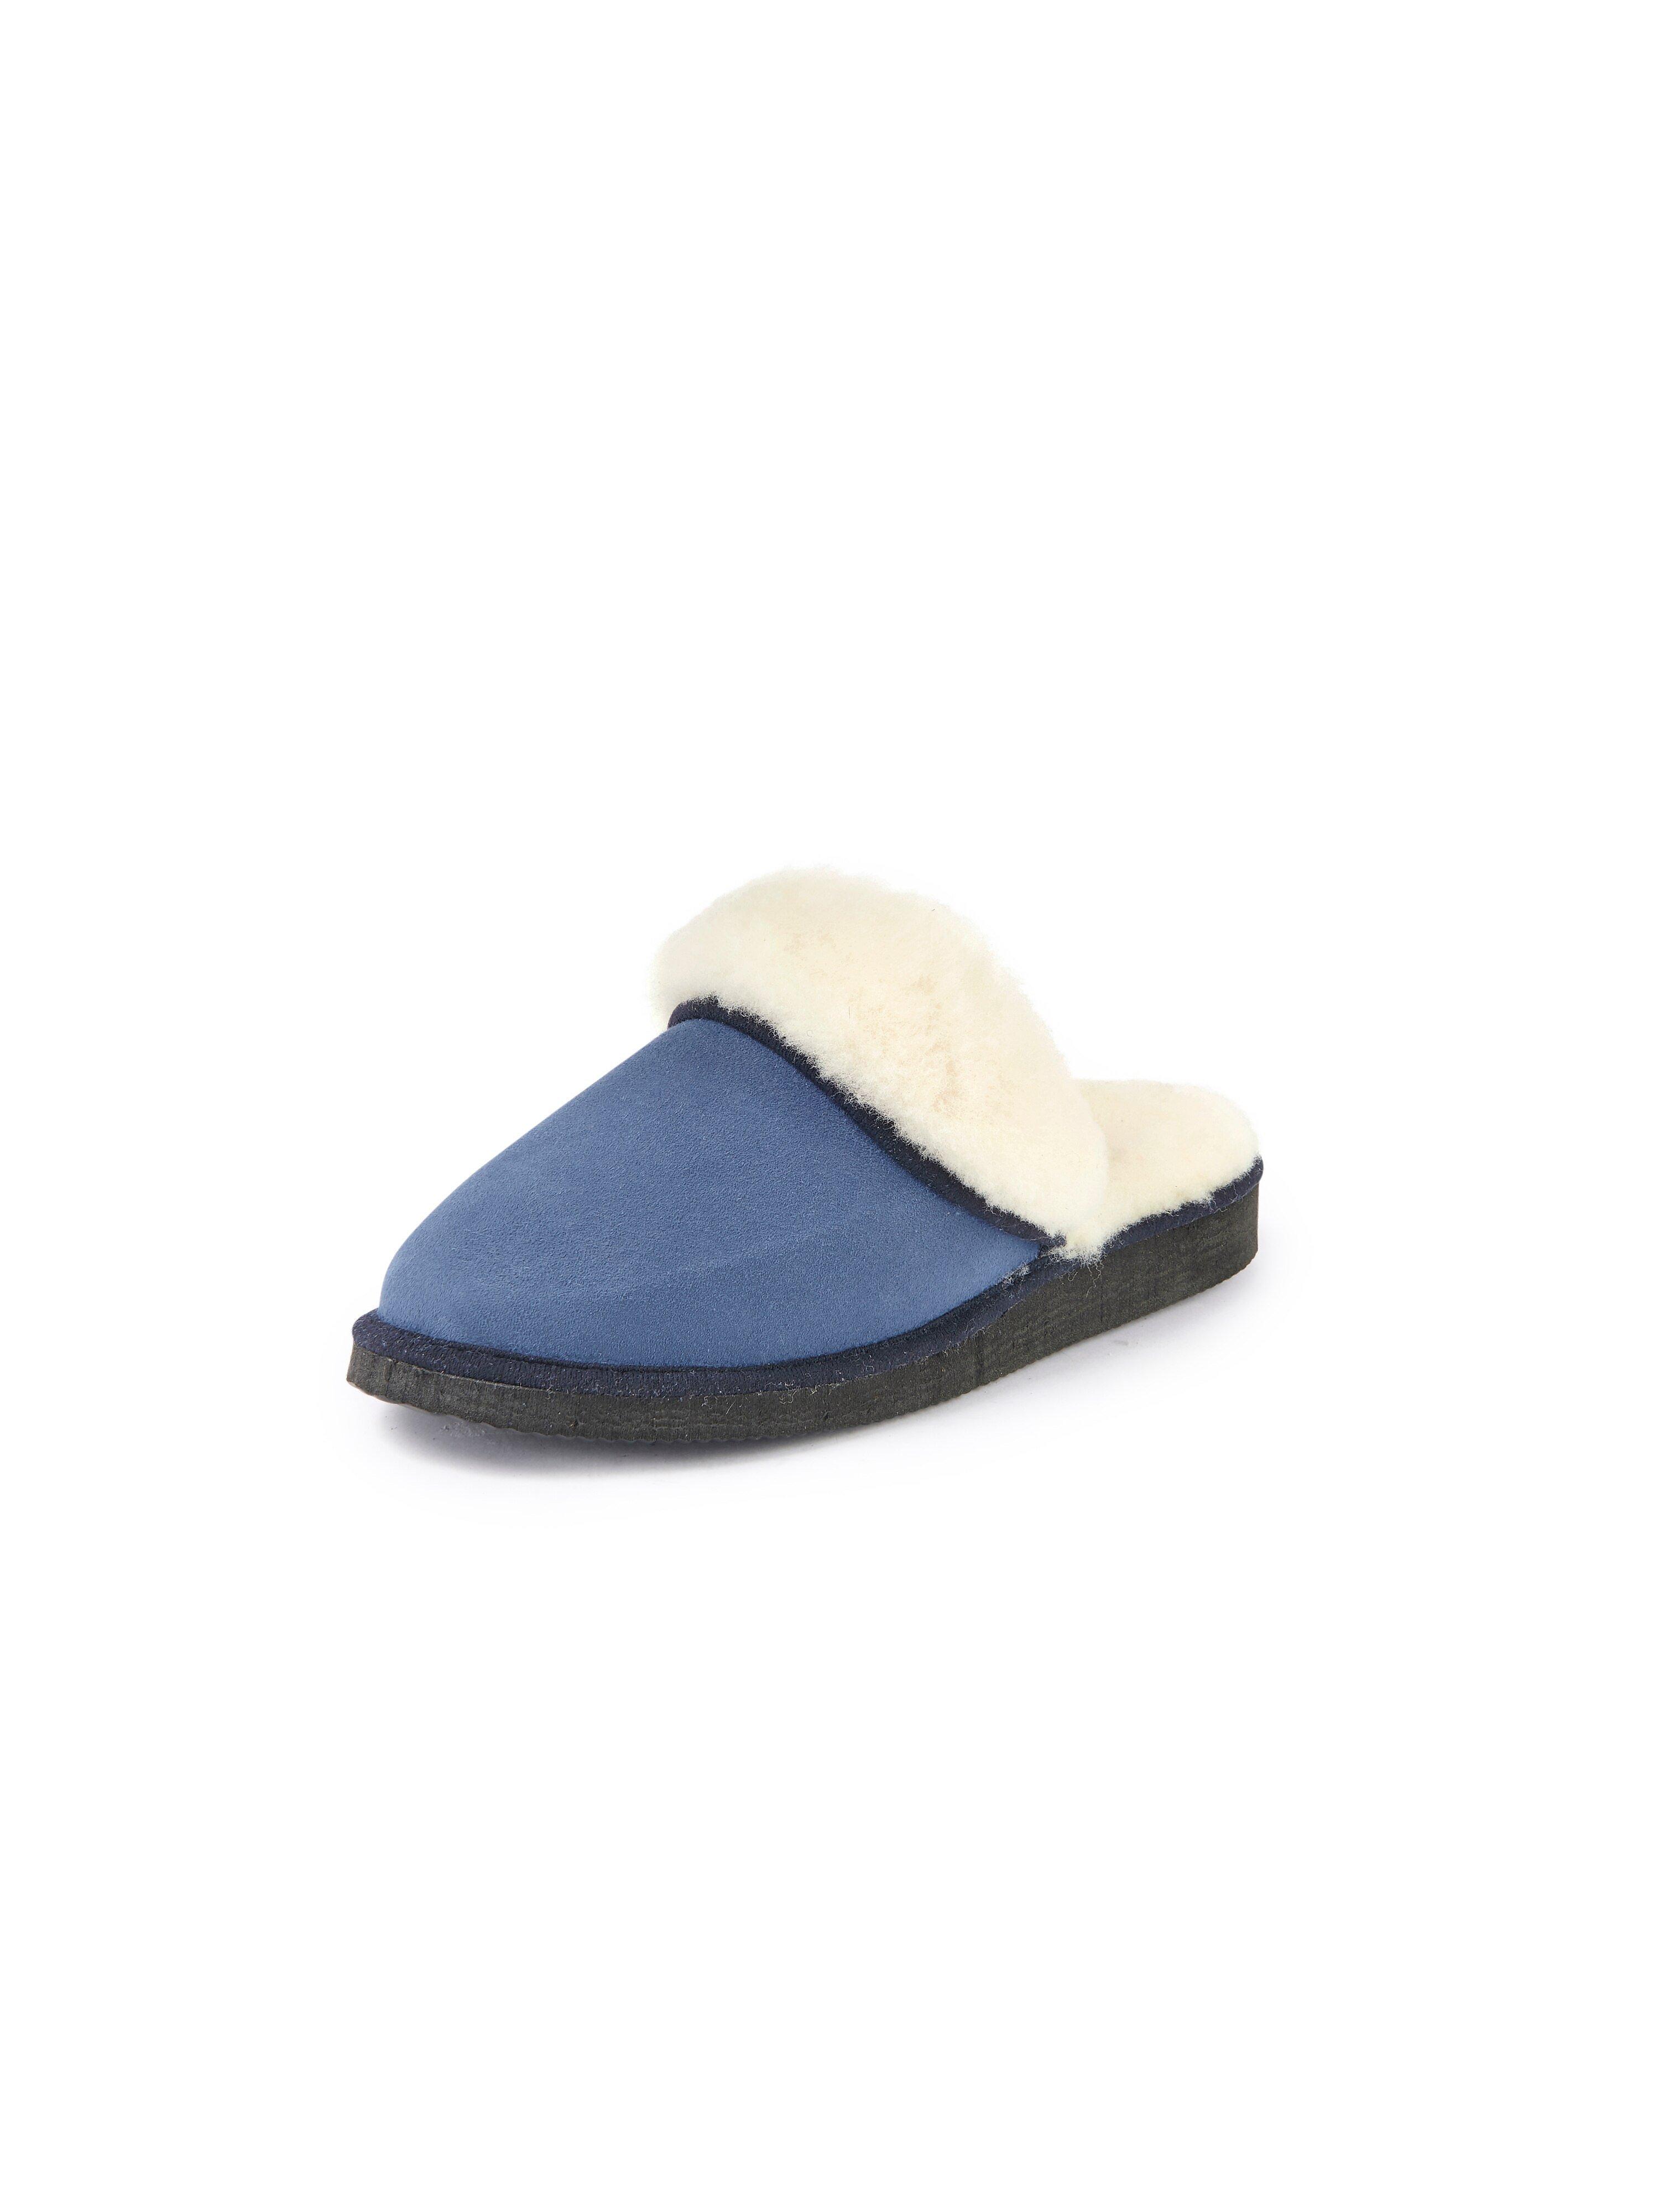 Pantoffels model Pala Van Kitzpichler blauw